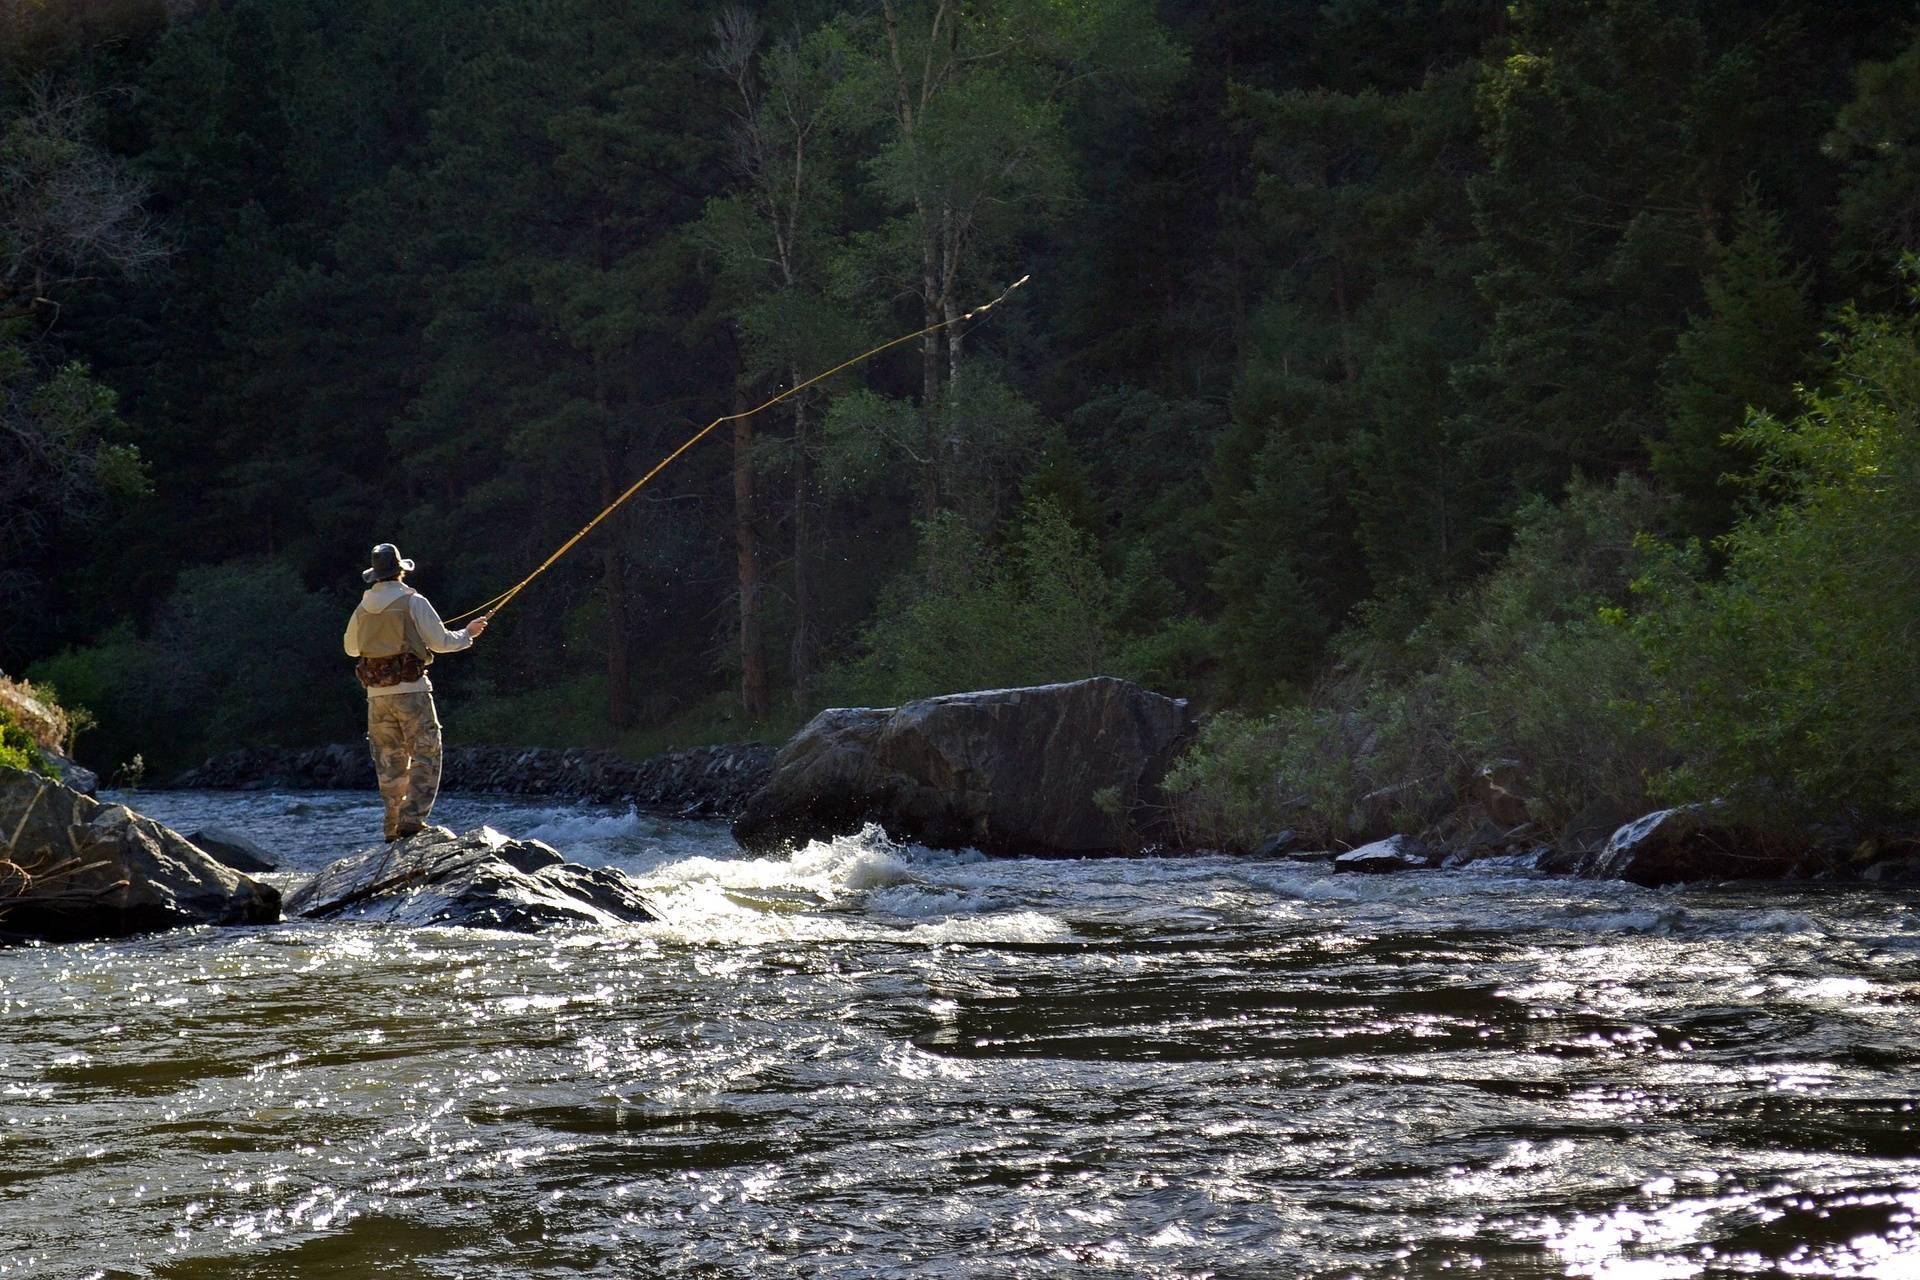 River Casting